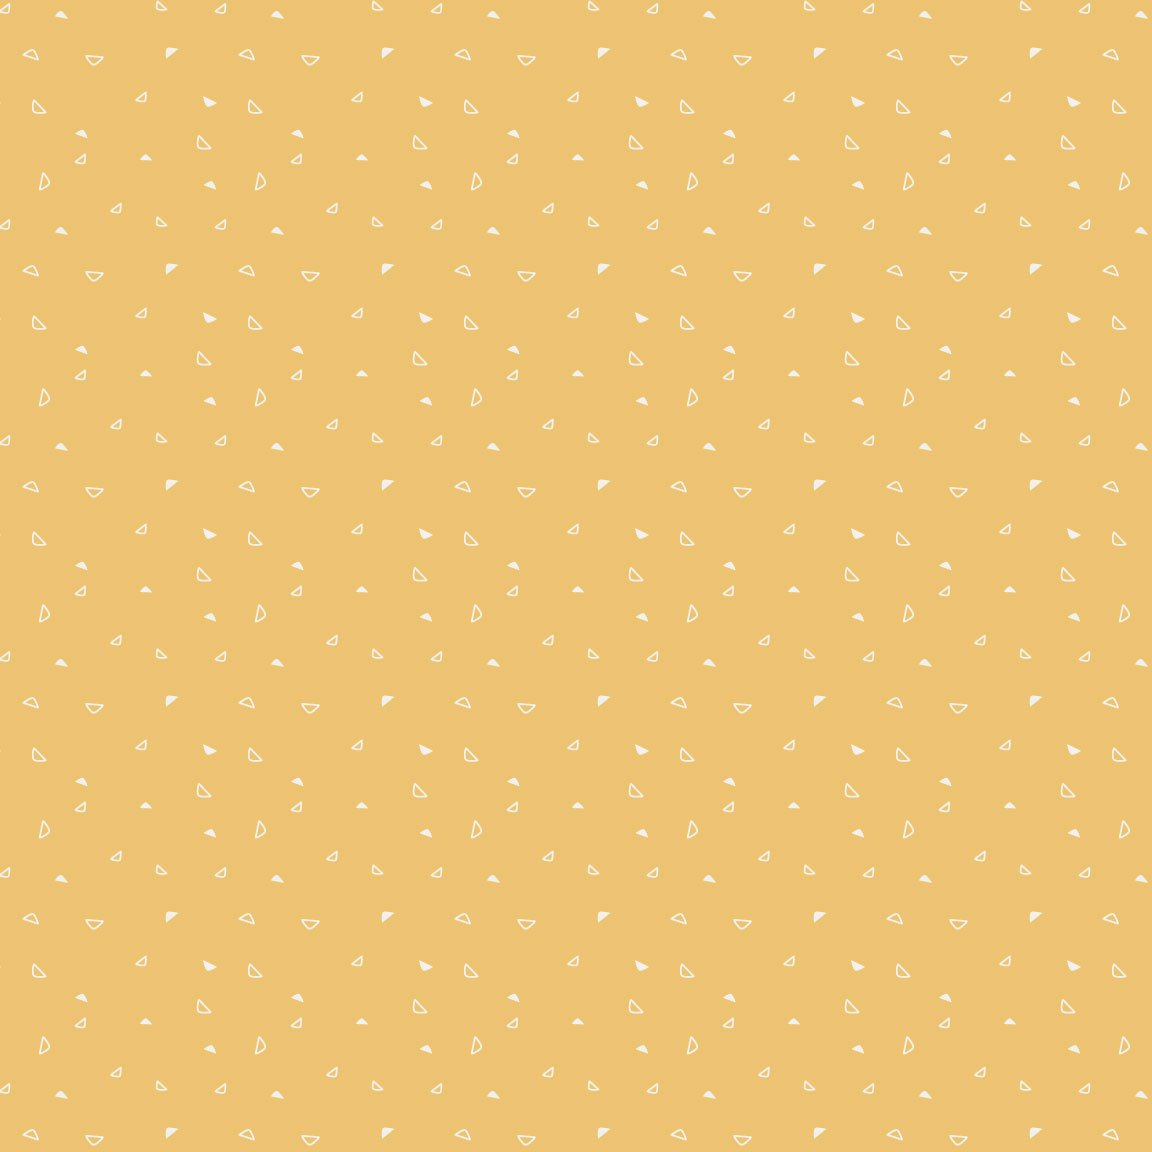 Blenders - Yellow - 105